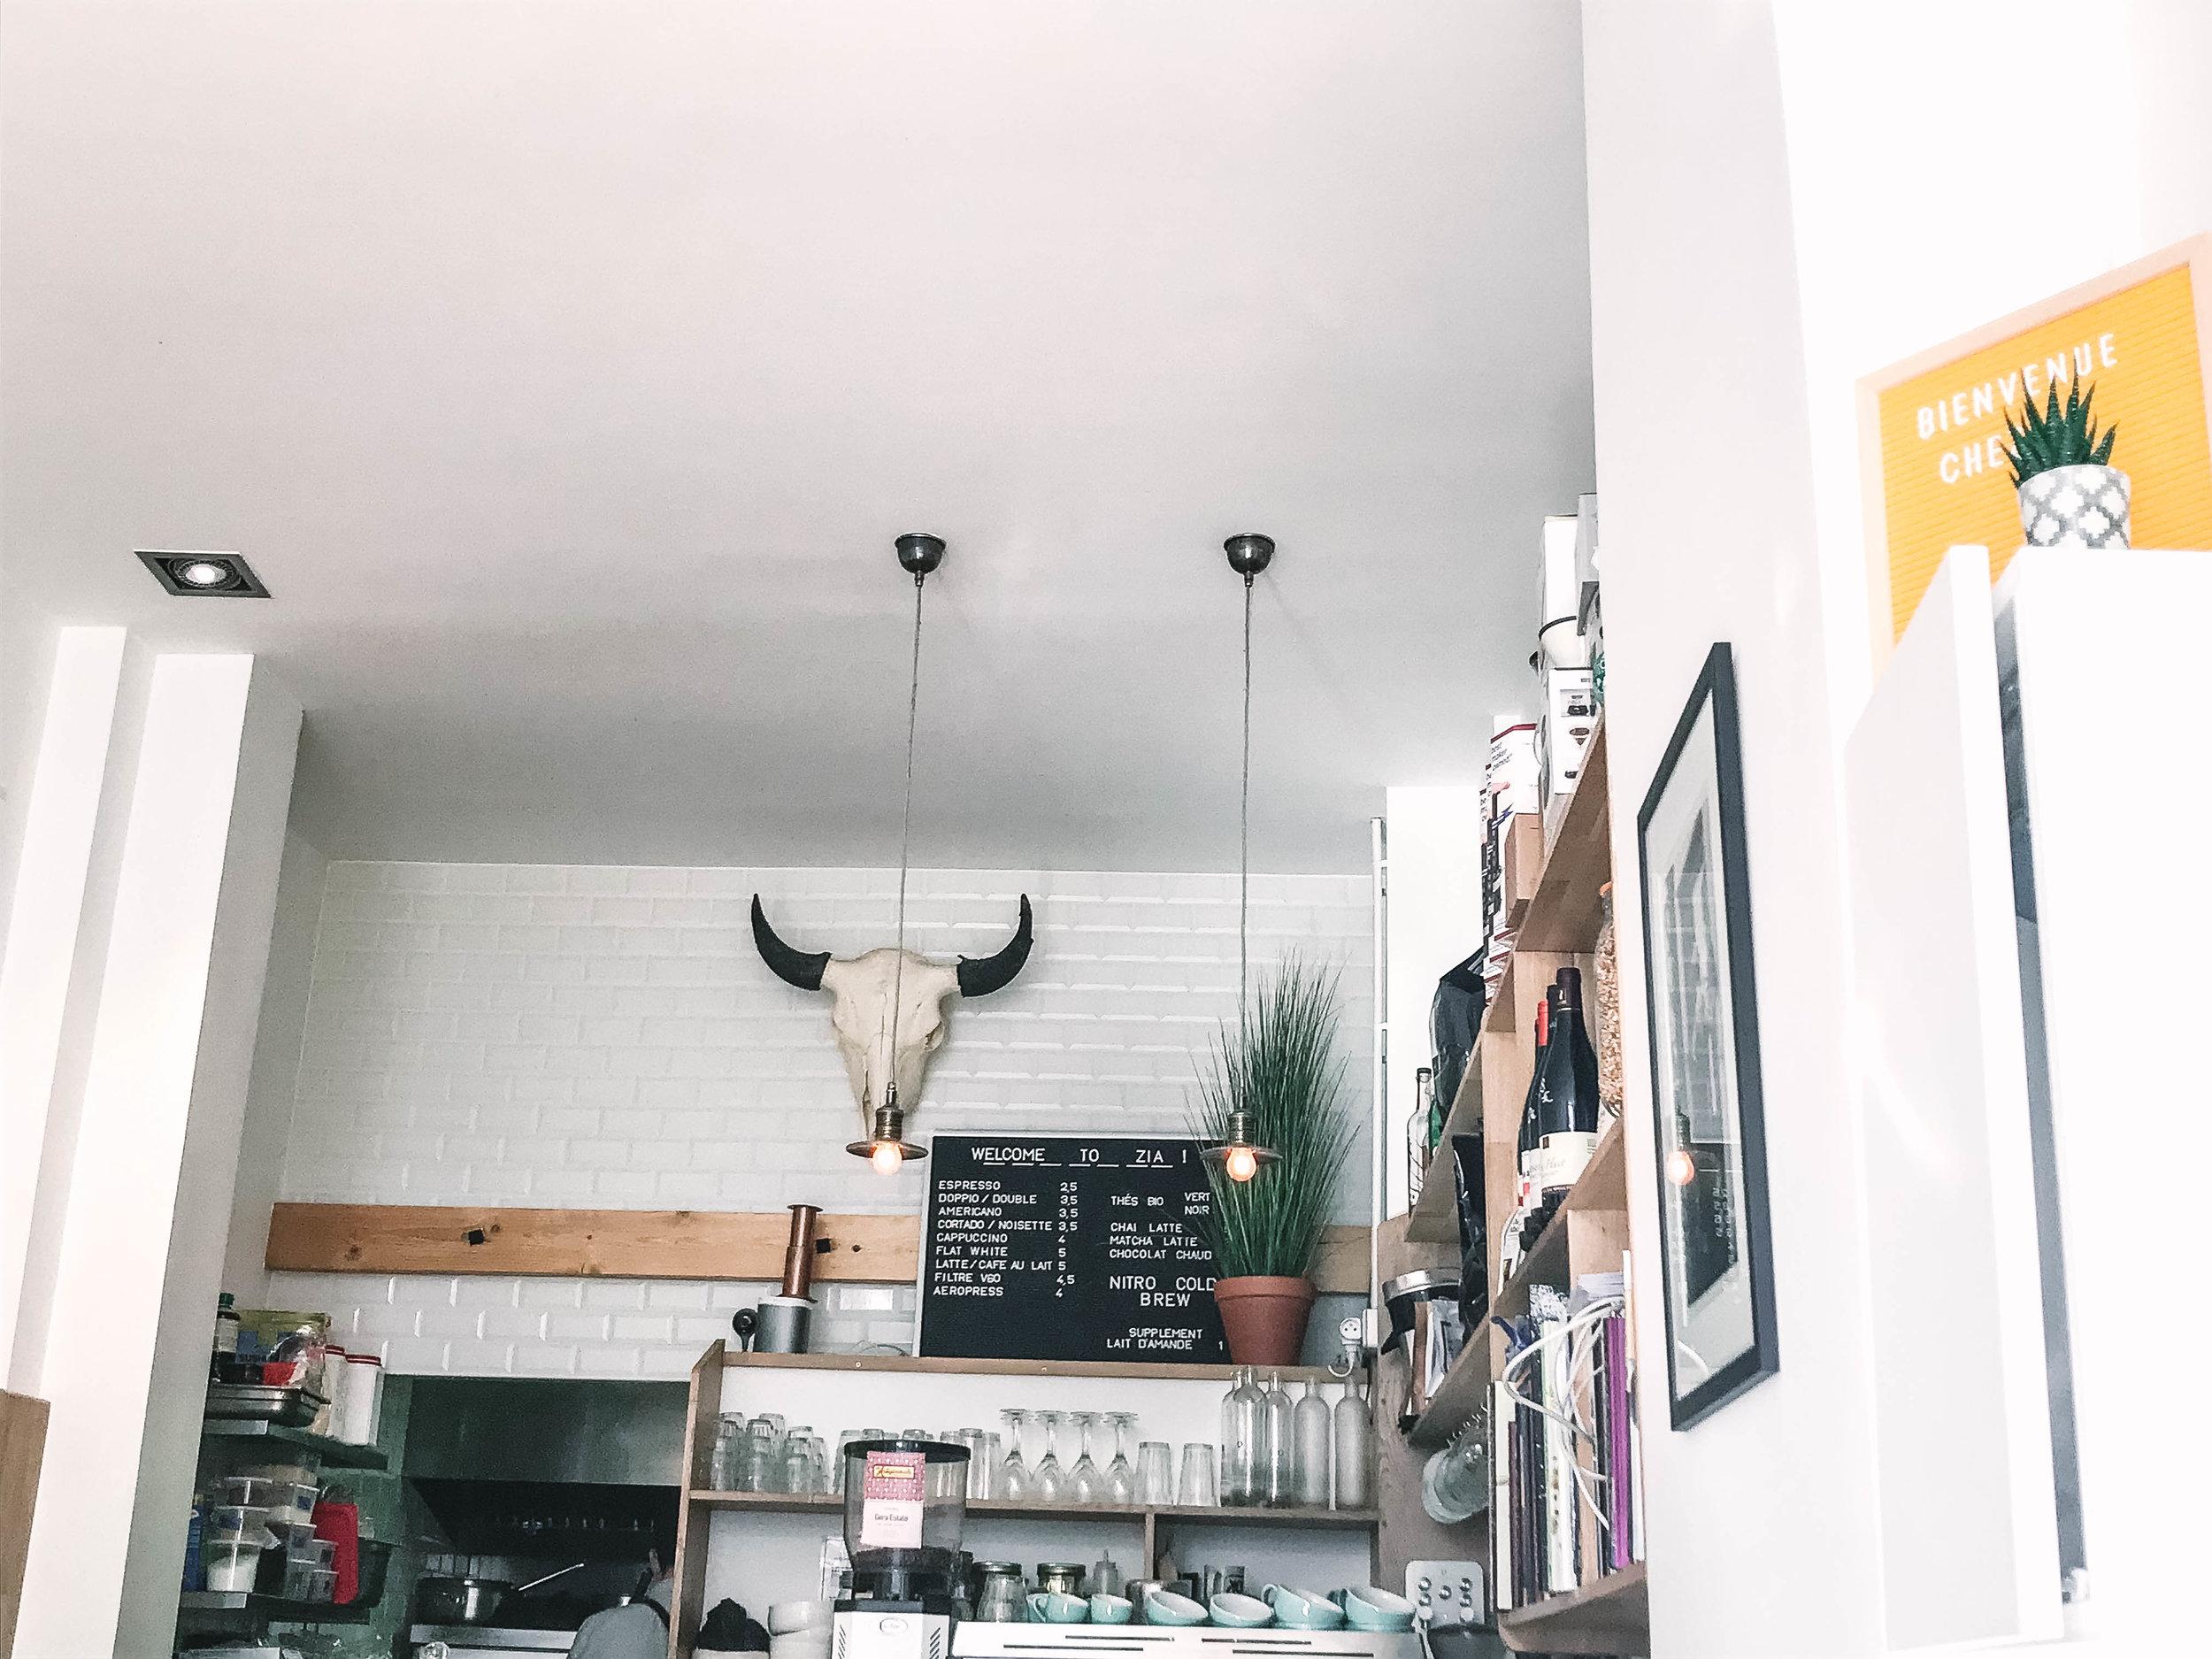 Zia Cafe - Hours: Closed Mondays, Tues-Fri 8:30-6, Sat-Sun 10-5